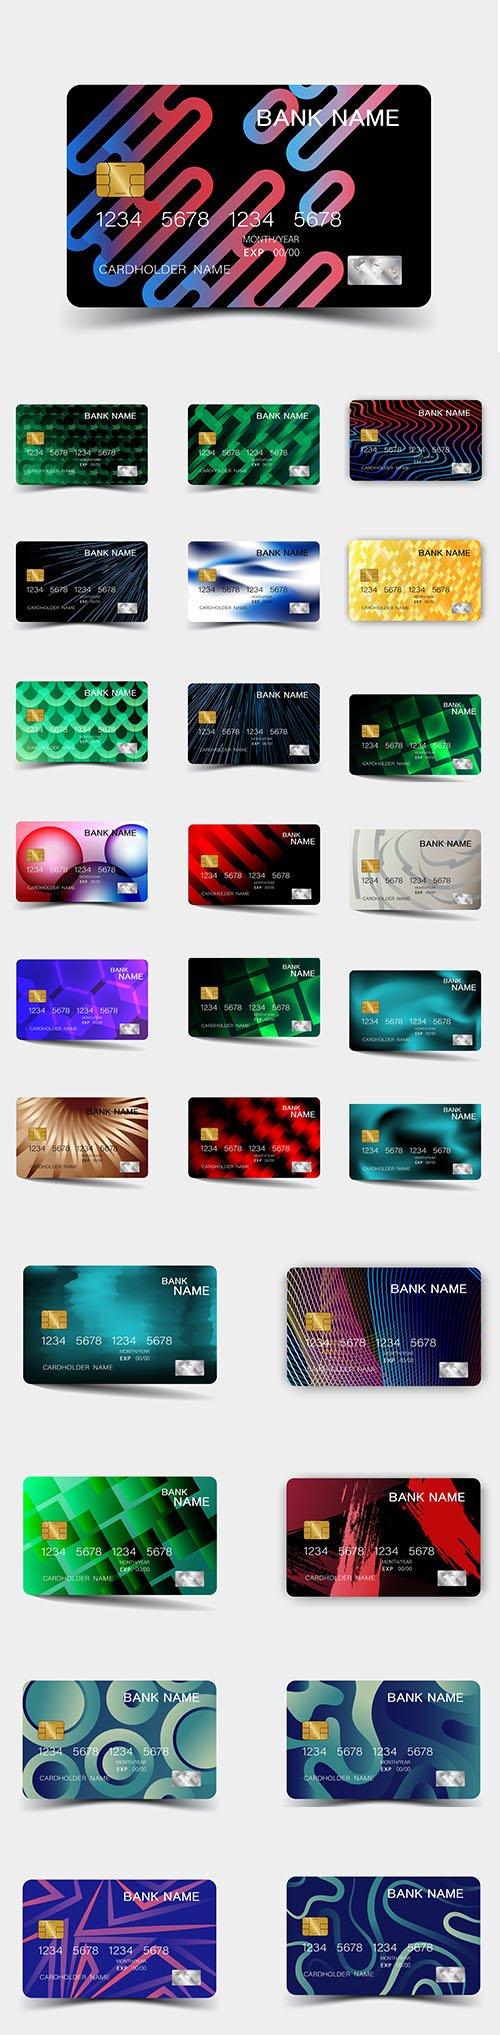 Credit Card Template Premium Vector Set